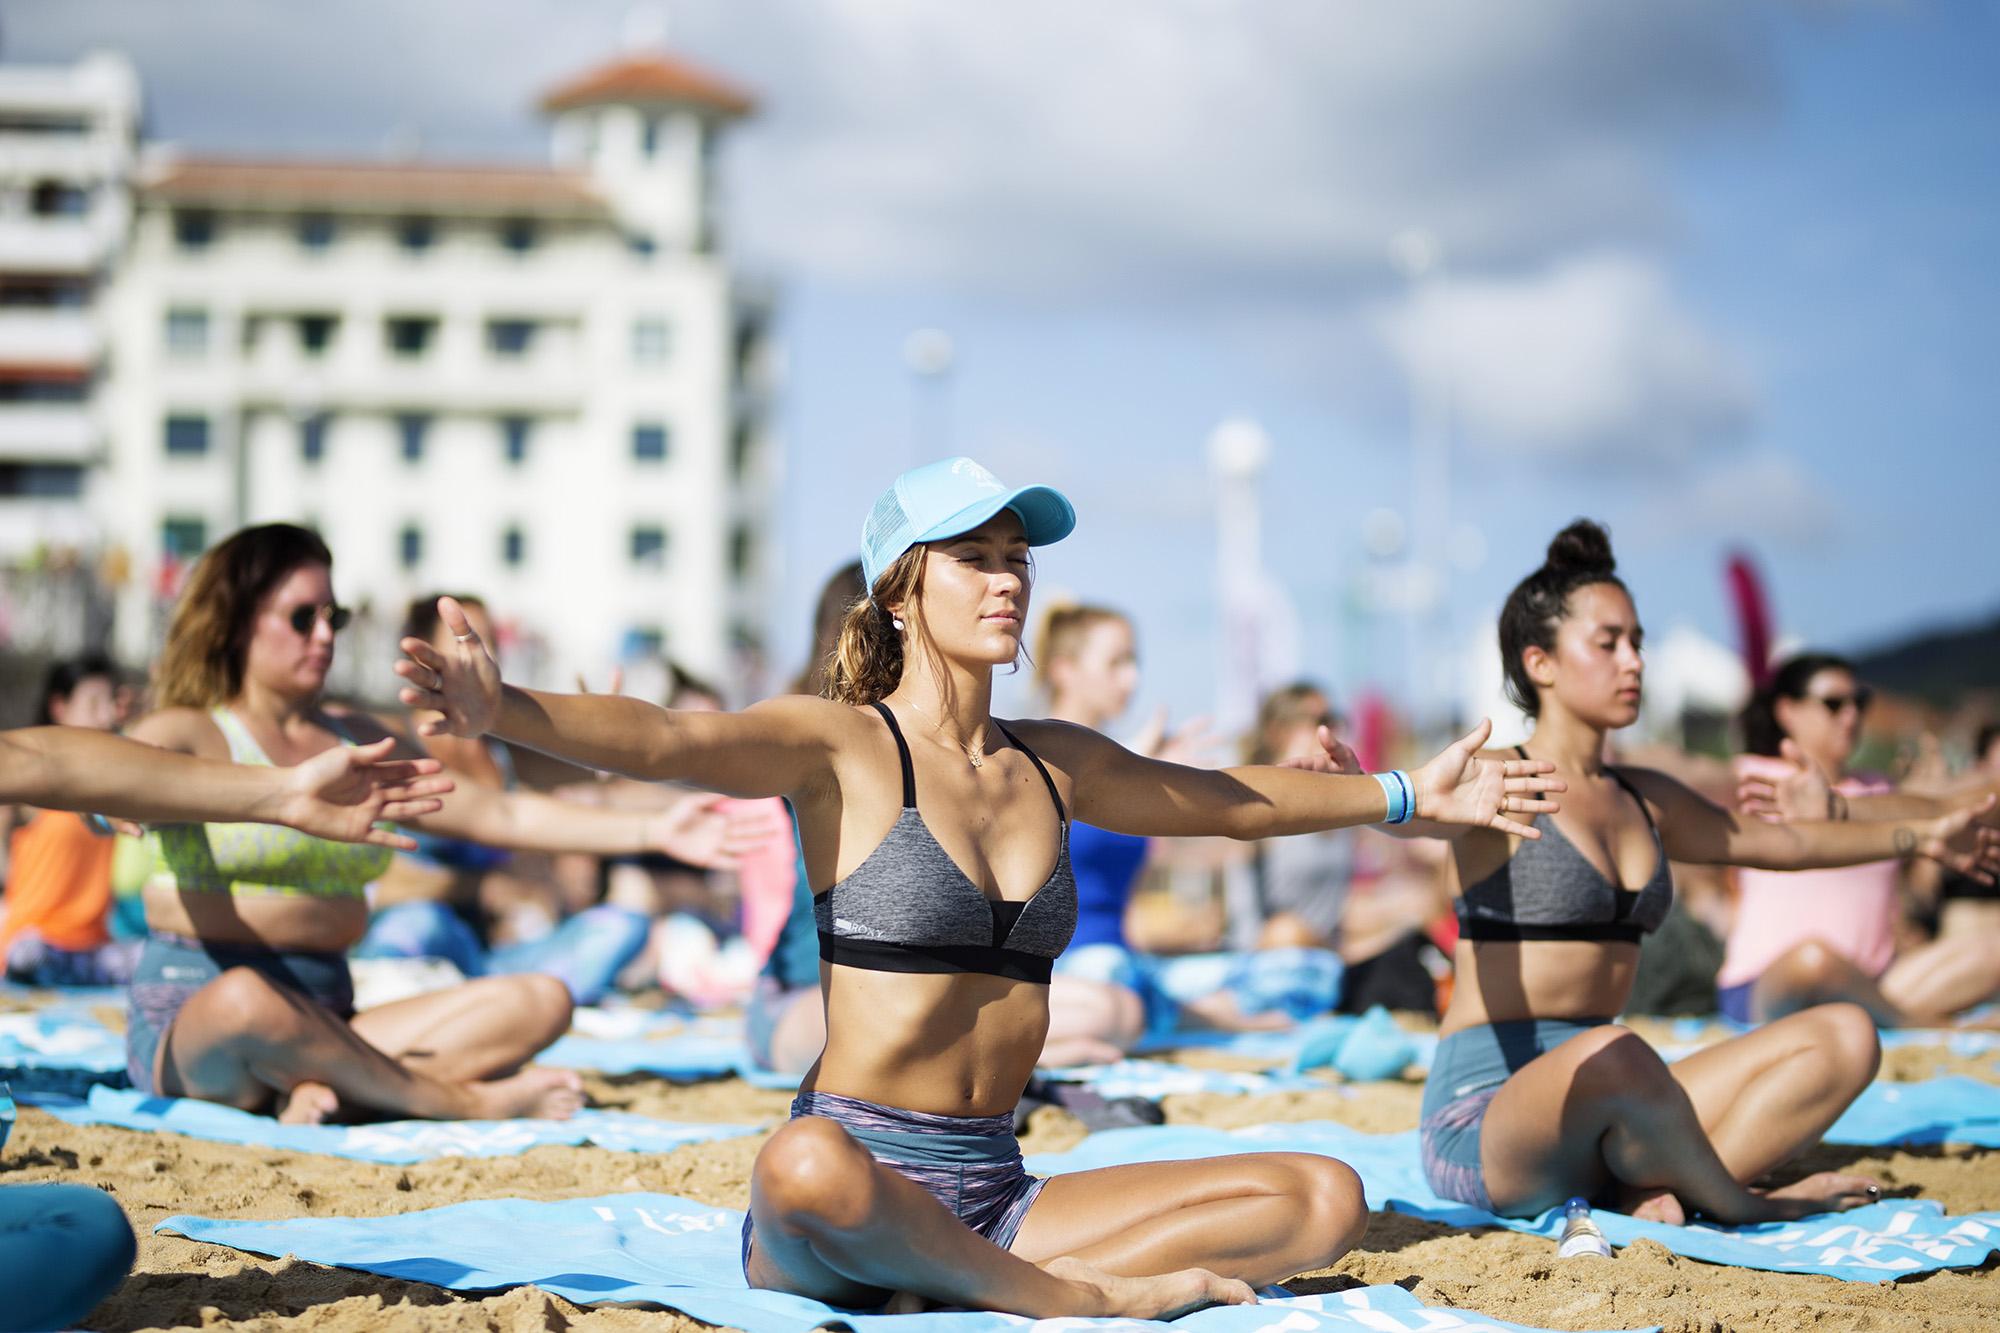 justine-mauvin-yoga-roxy-fitness-san-sebastian-2017-guillaume-arrieta-we-creative